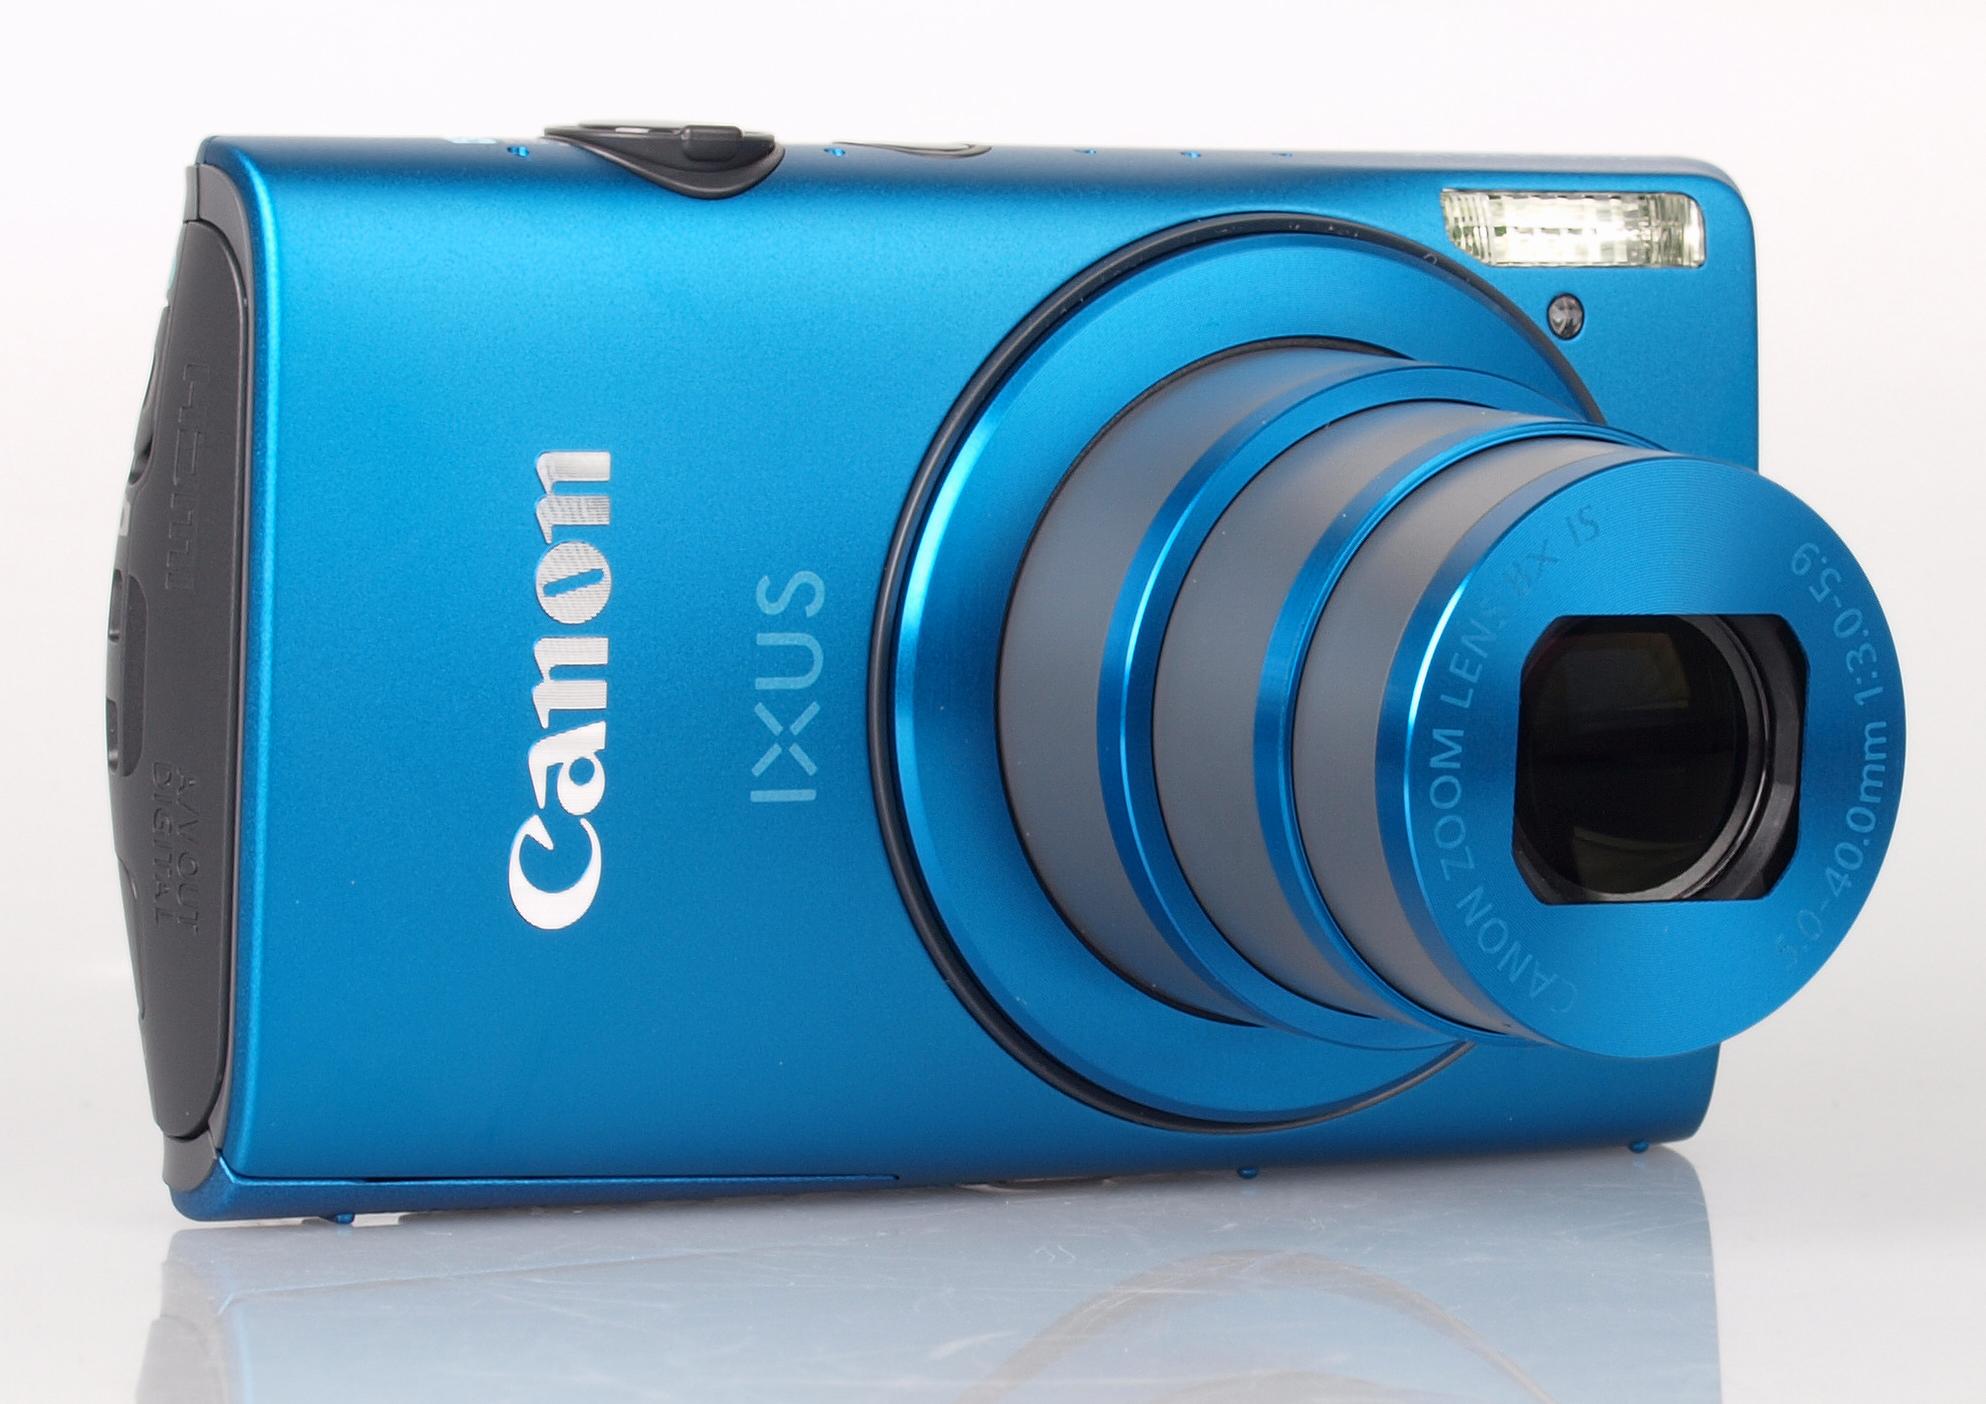 Canon powershot sx230 hs digital camera (black) 5043b001 b&h.